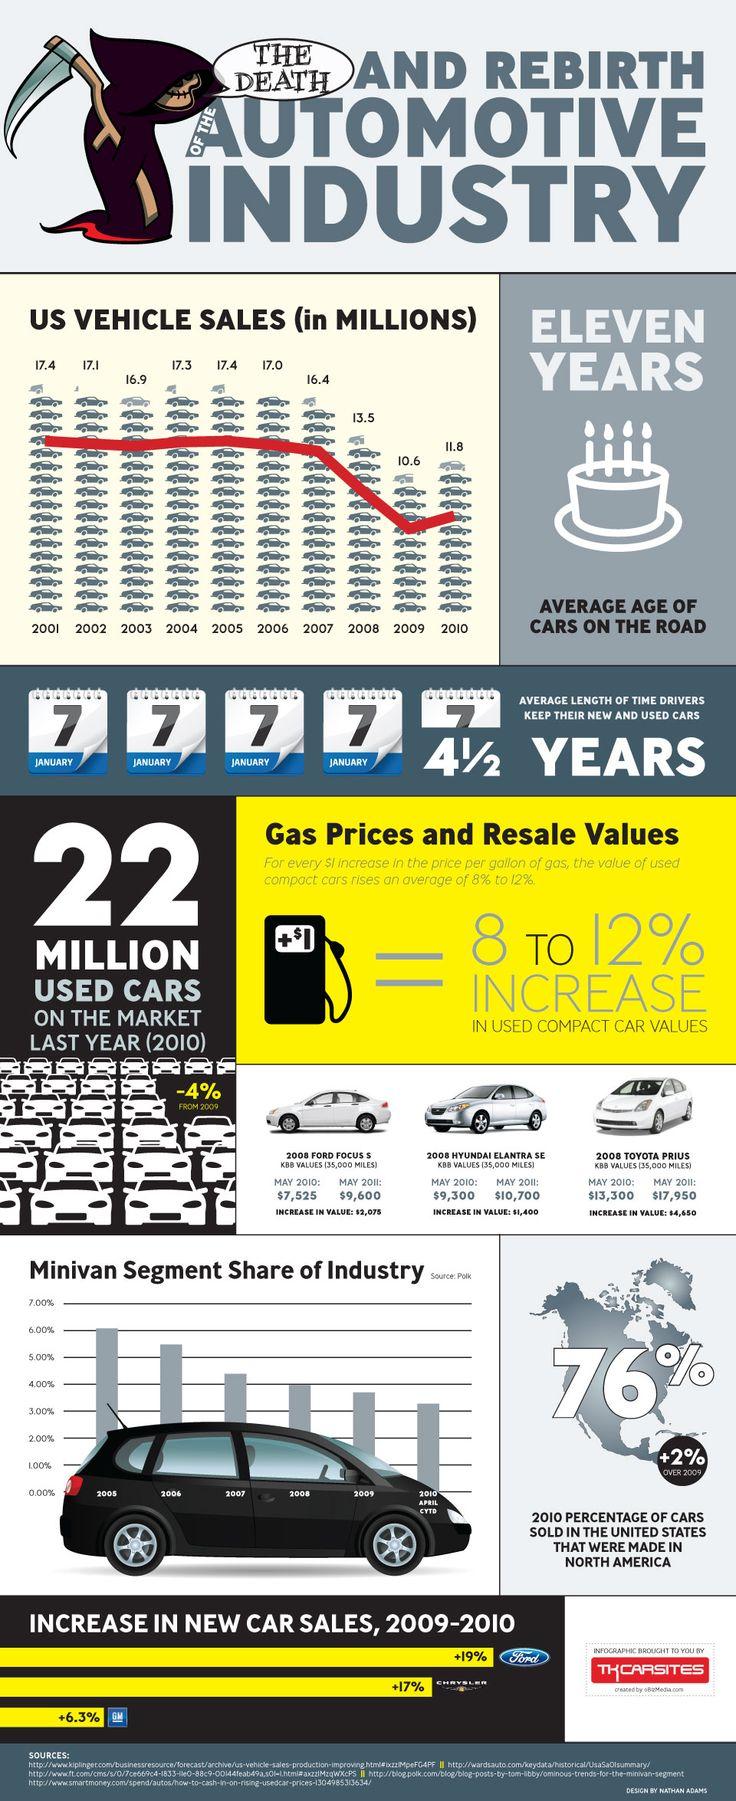 The Automotive Industry via Social News Watch #infographic #automotive #design